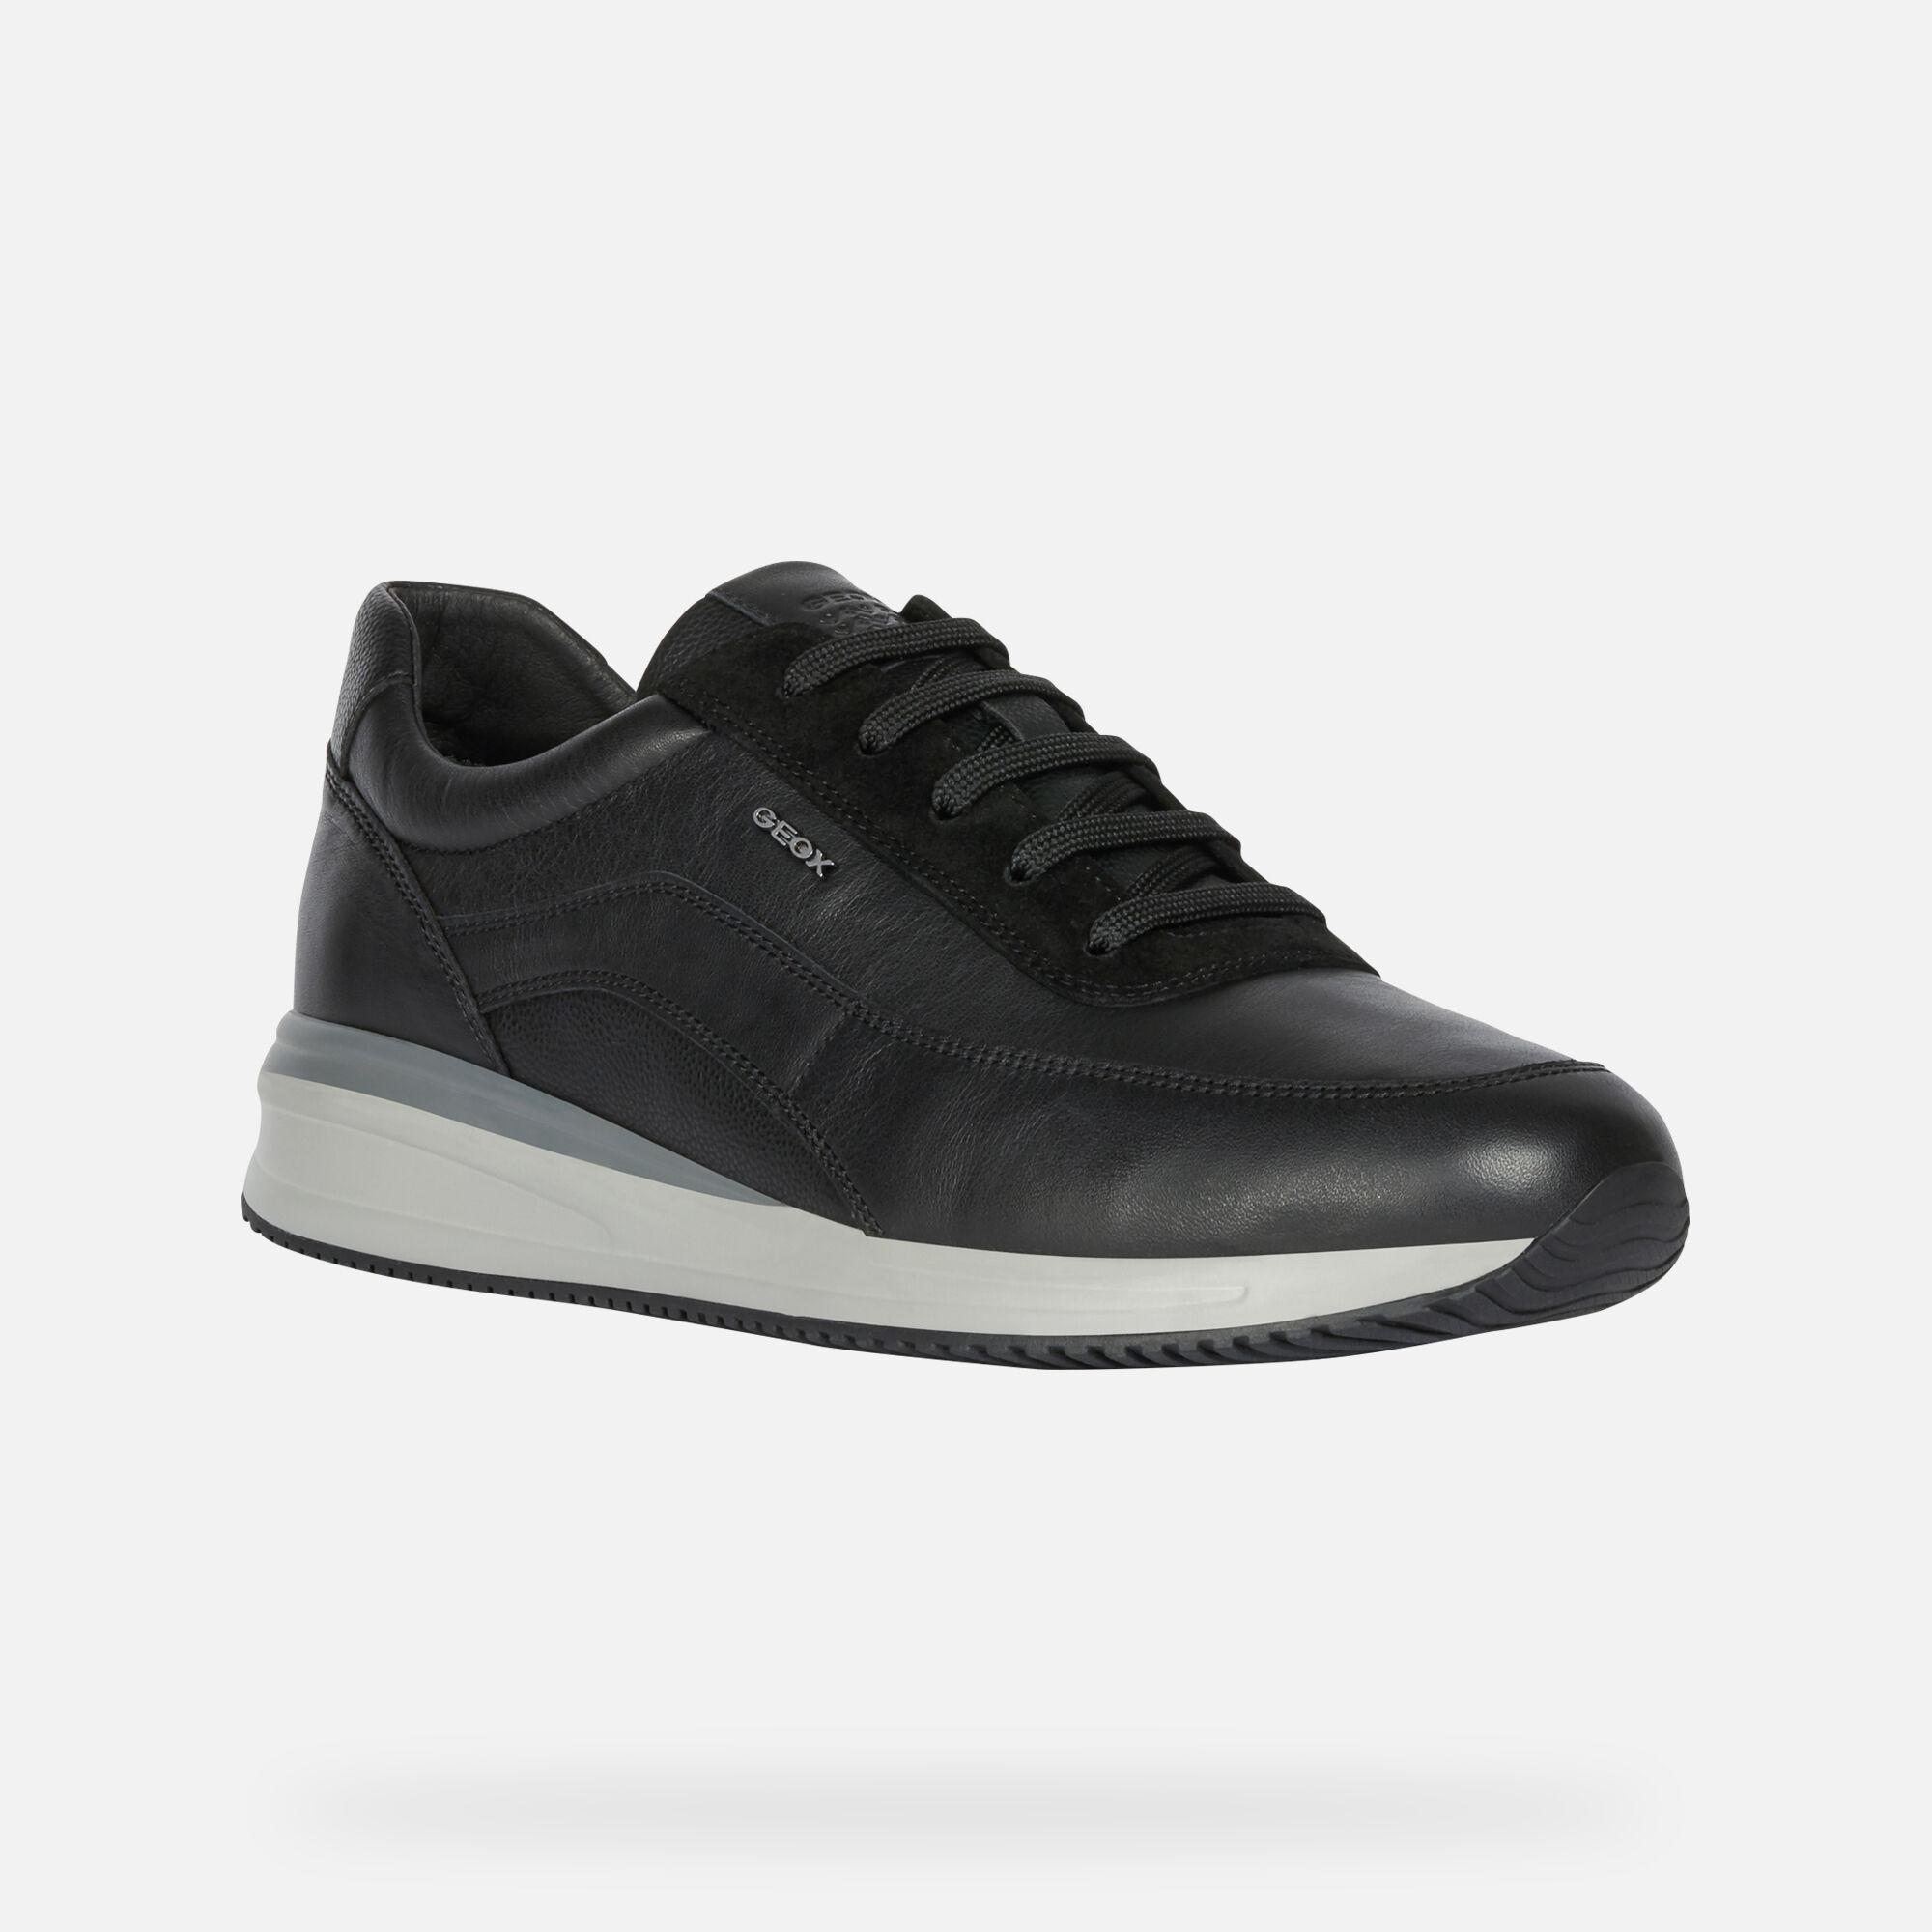 DENNIE UOMO Navy   Sneakers Geox Uomo